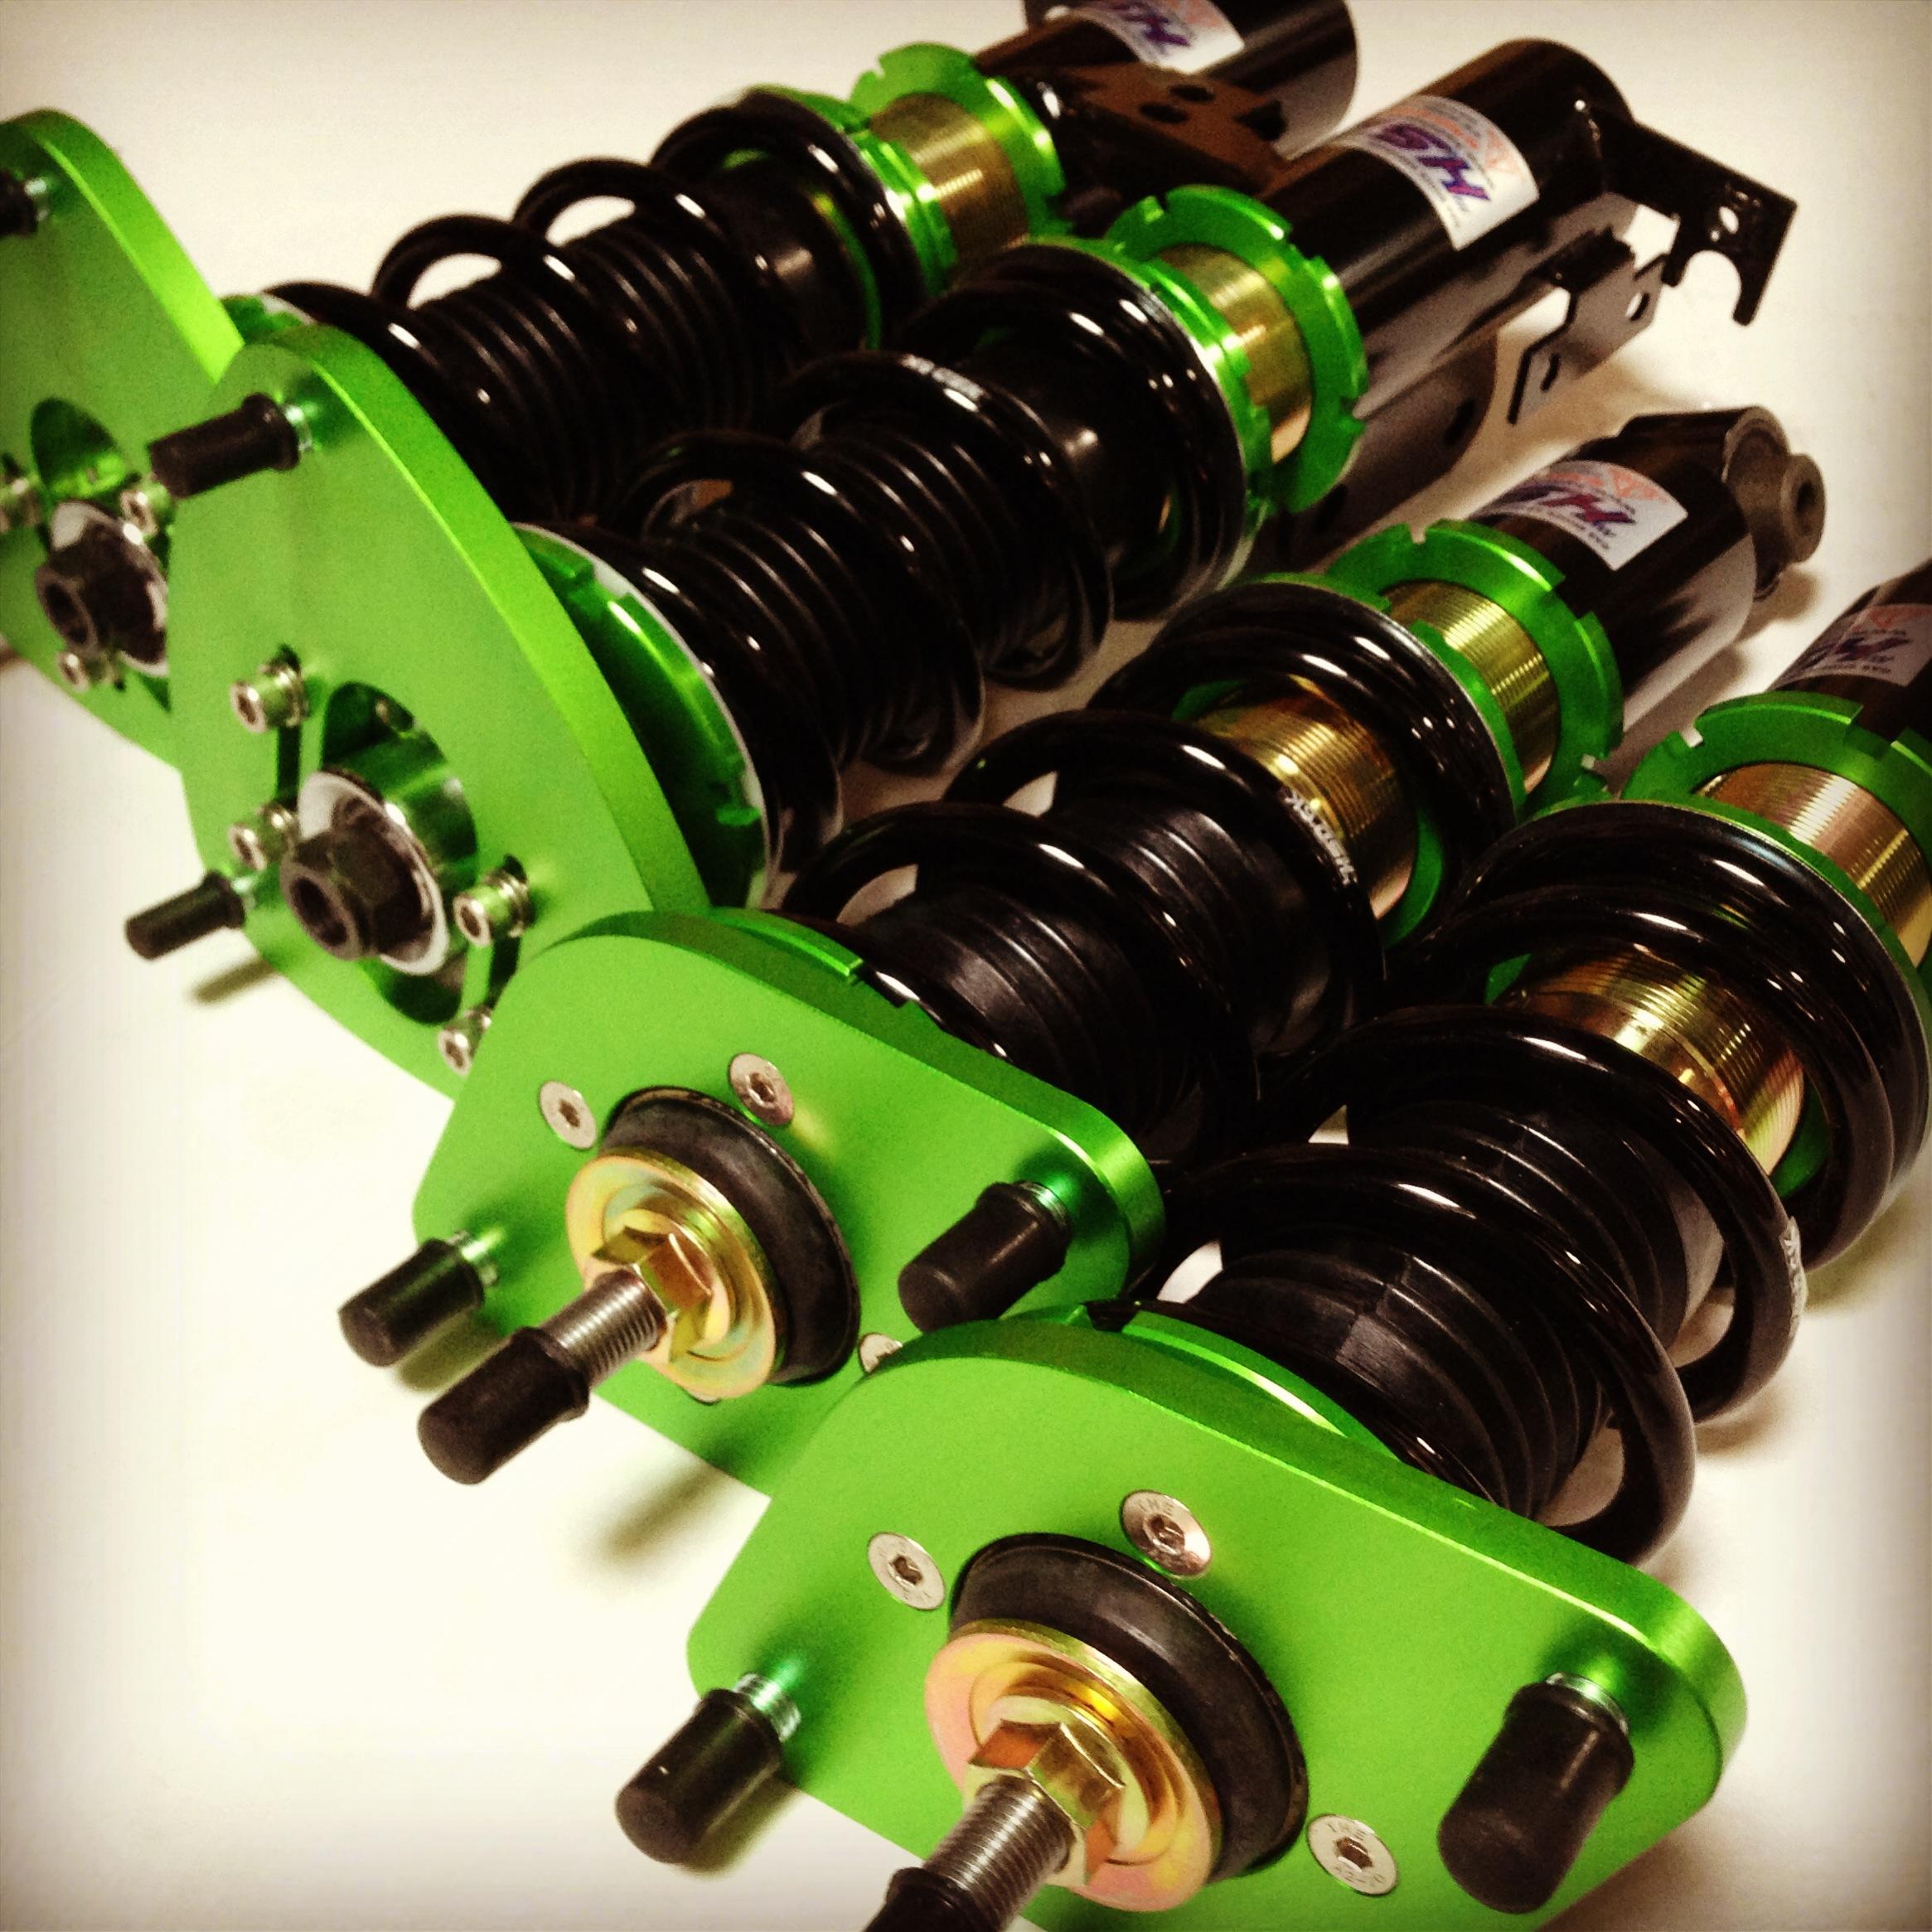 HSD MonoPro Coilover Suspension Kit For FRS/BRZ